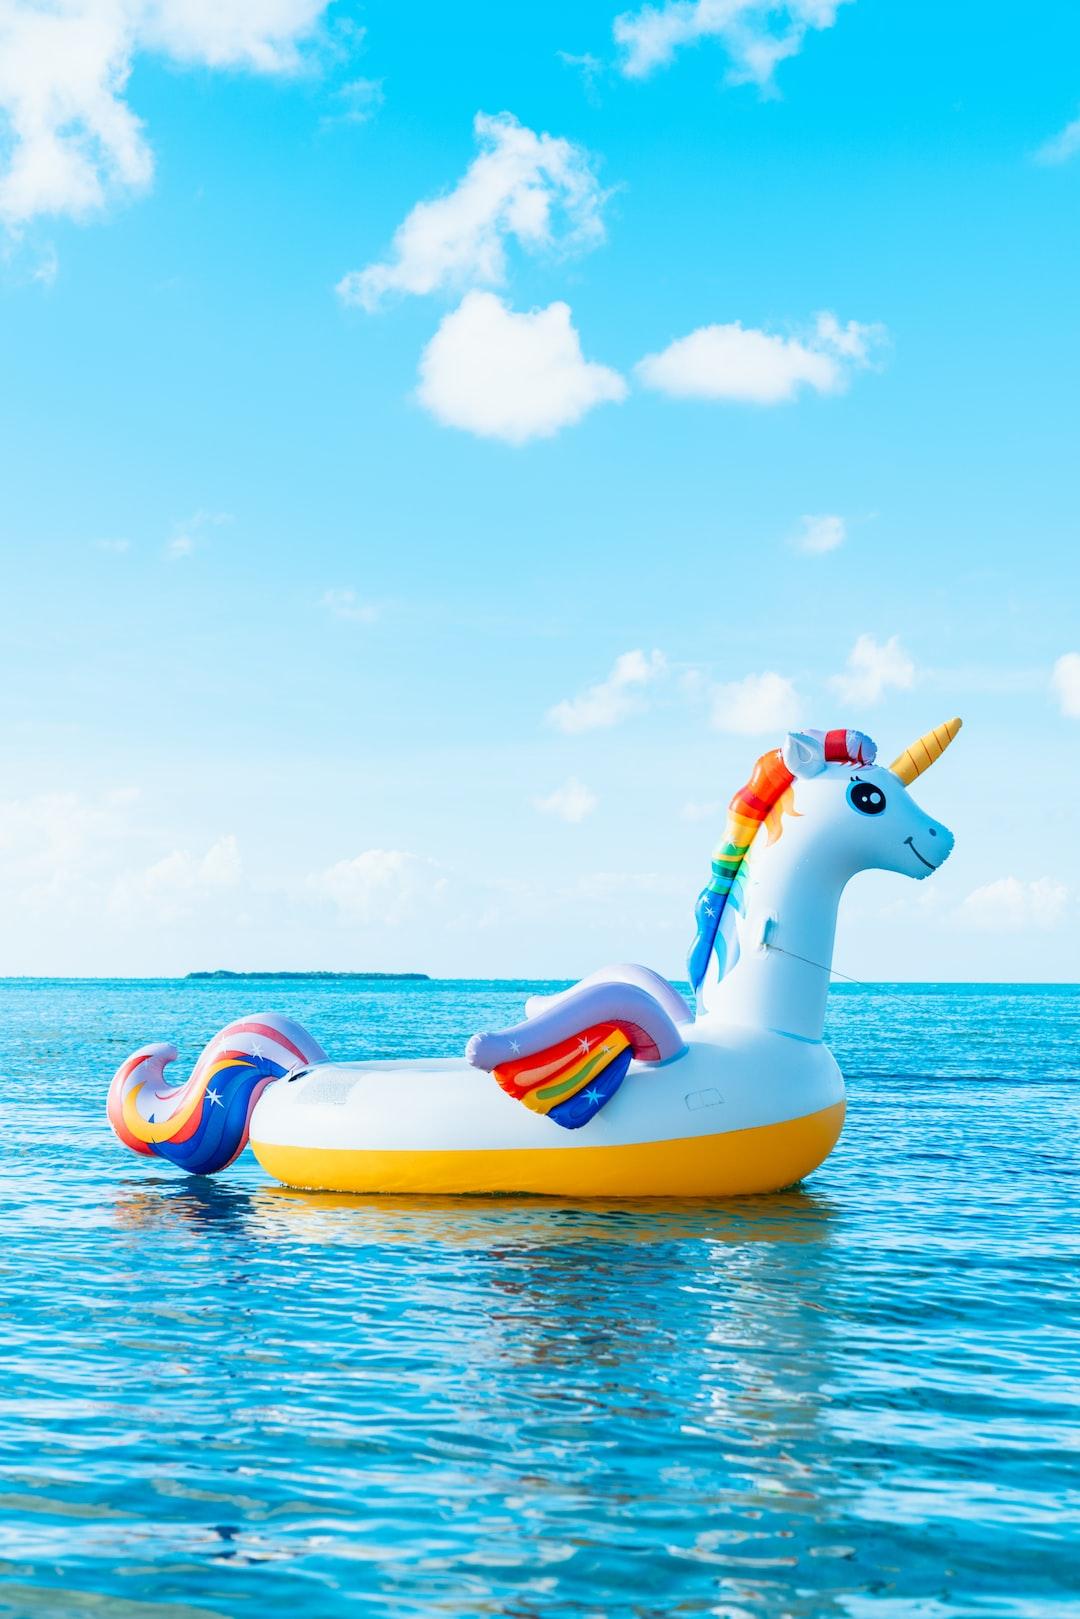 Rainbow unicorn inflatable inner tube in tropical island ocean water.